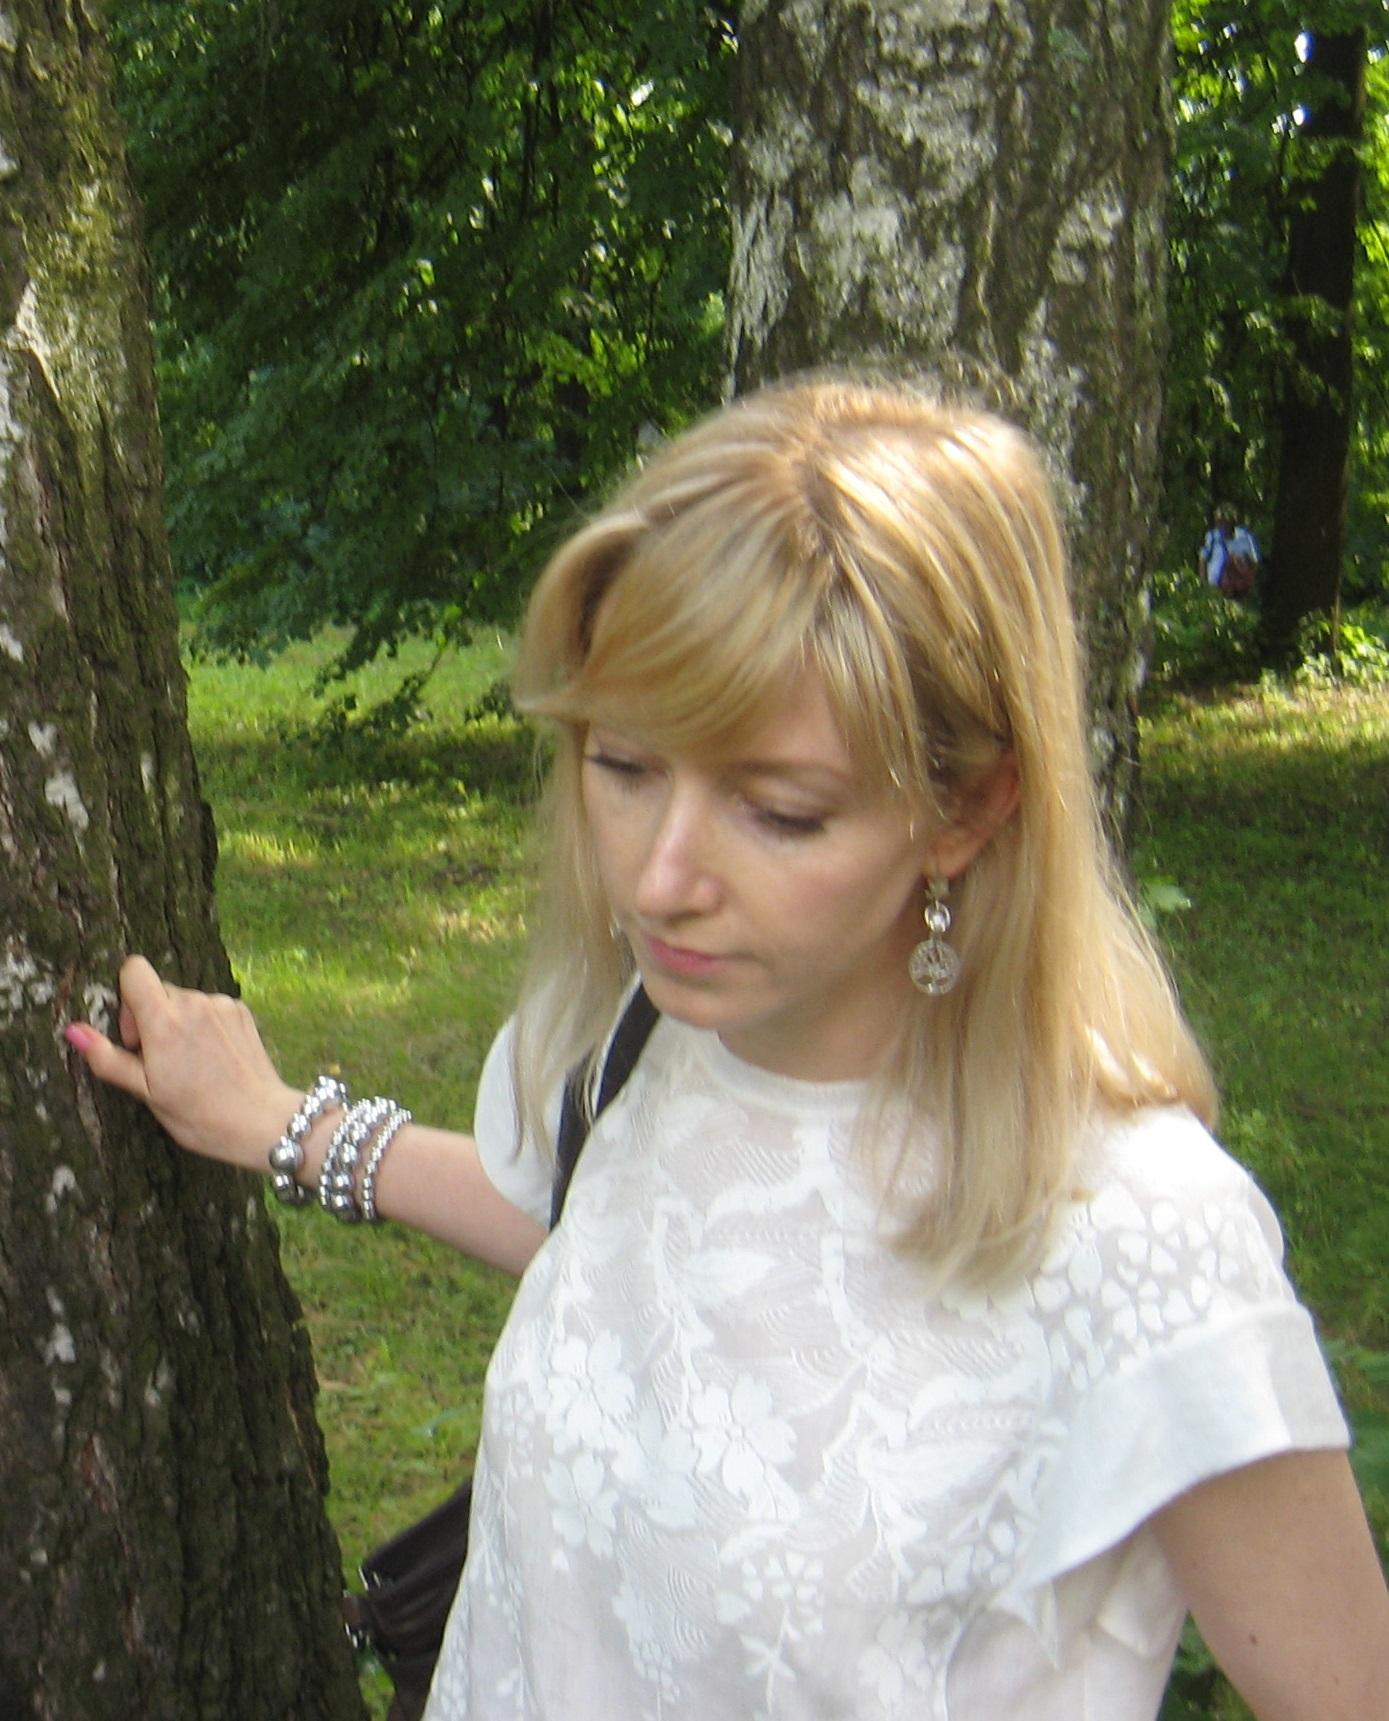 Анастасия Орлова — лауреат премии Президента России